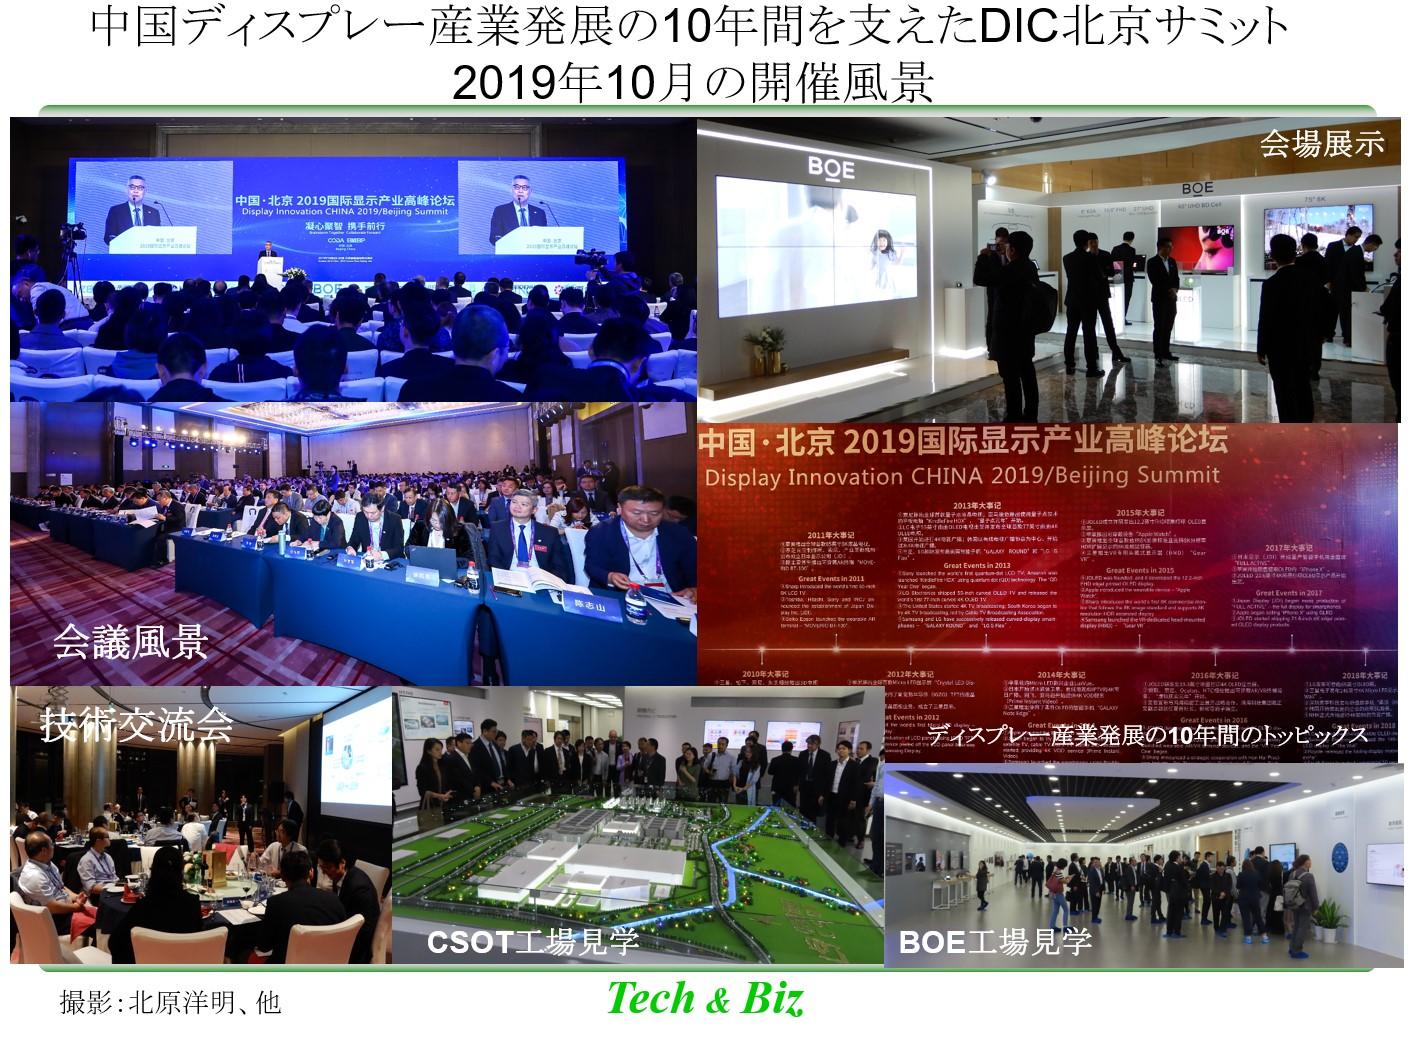 DIC 2019開催風景